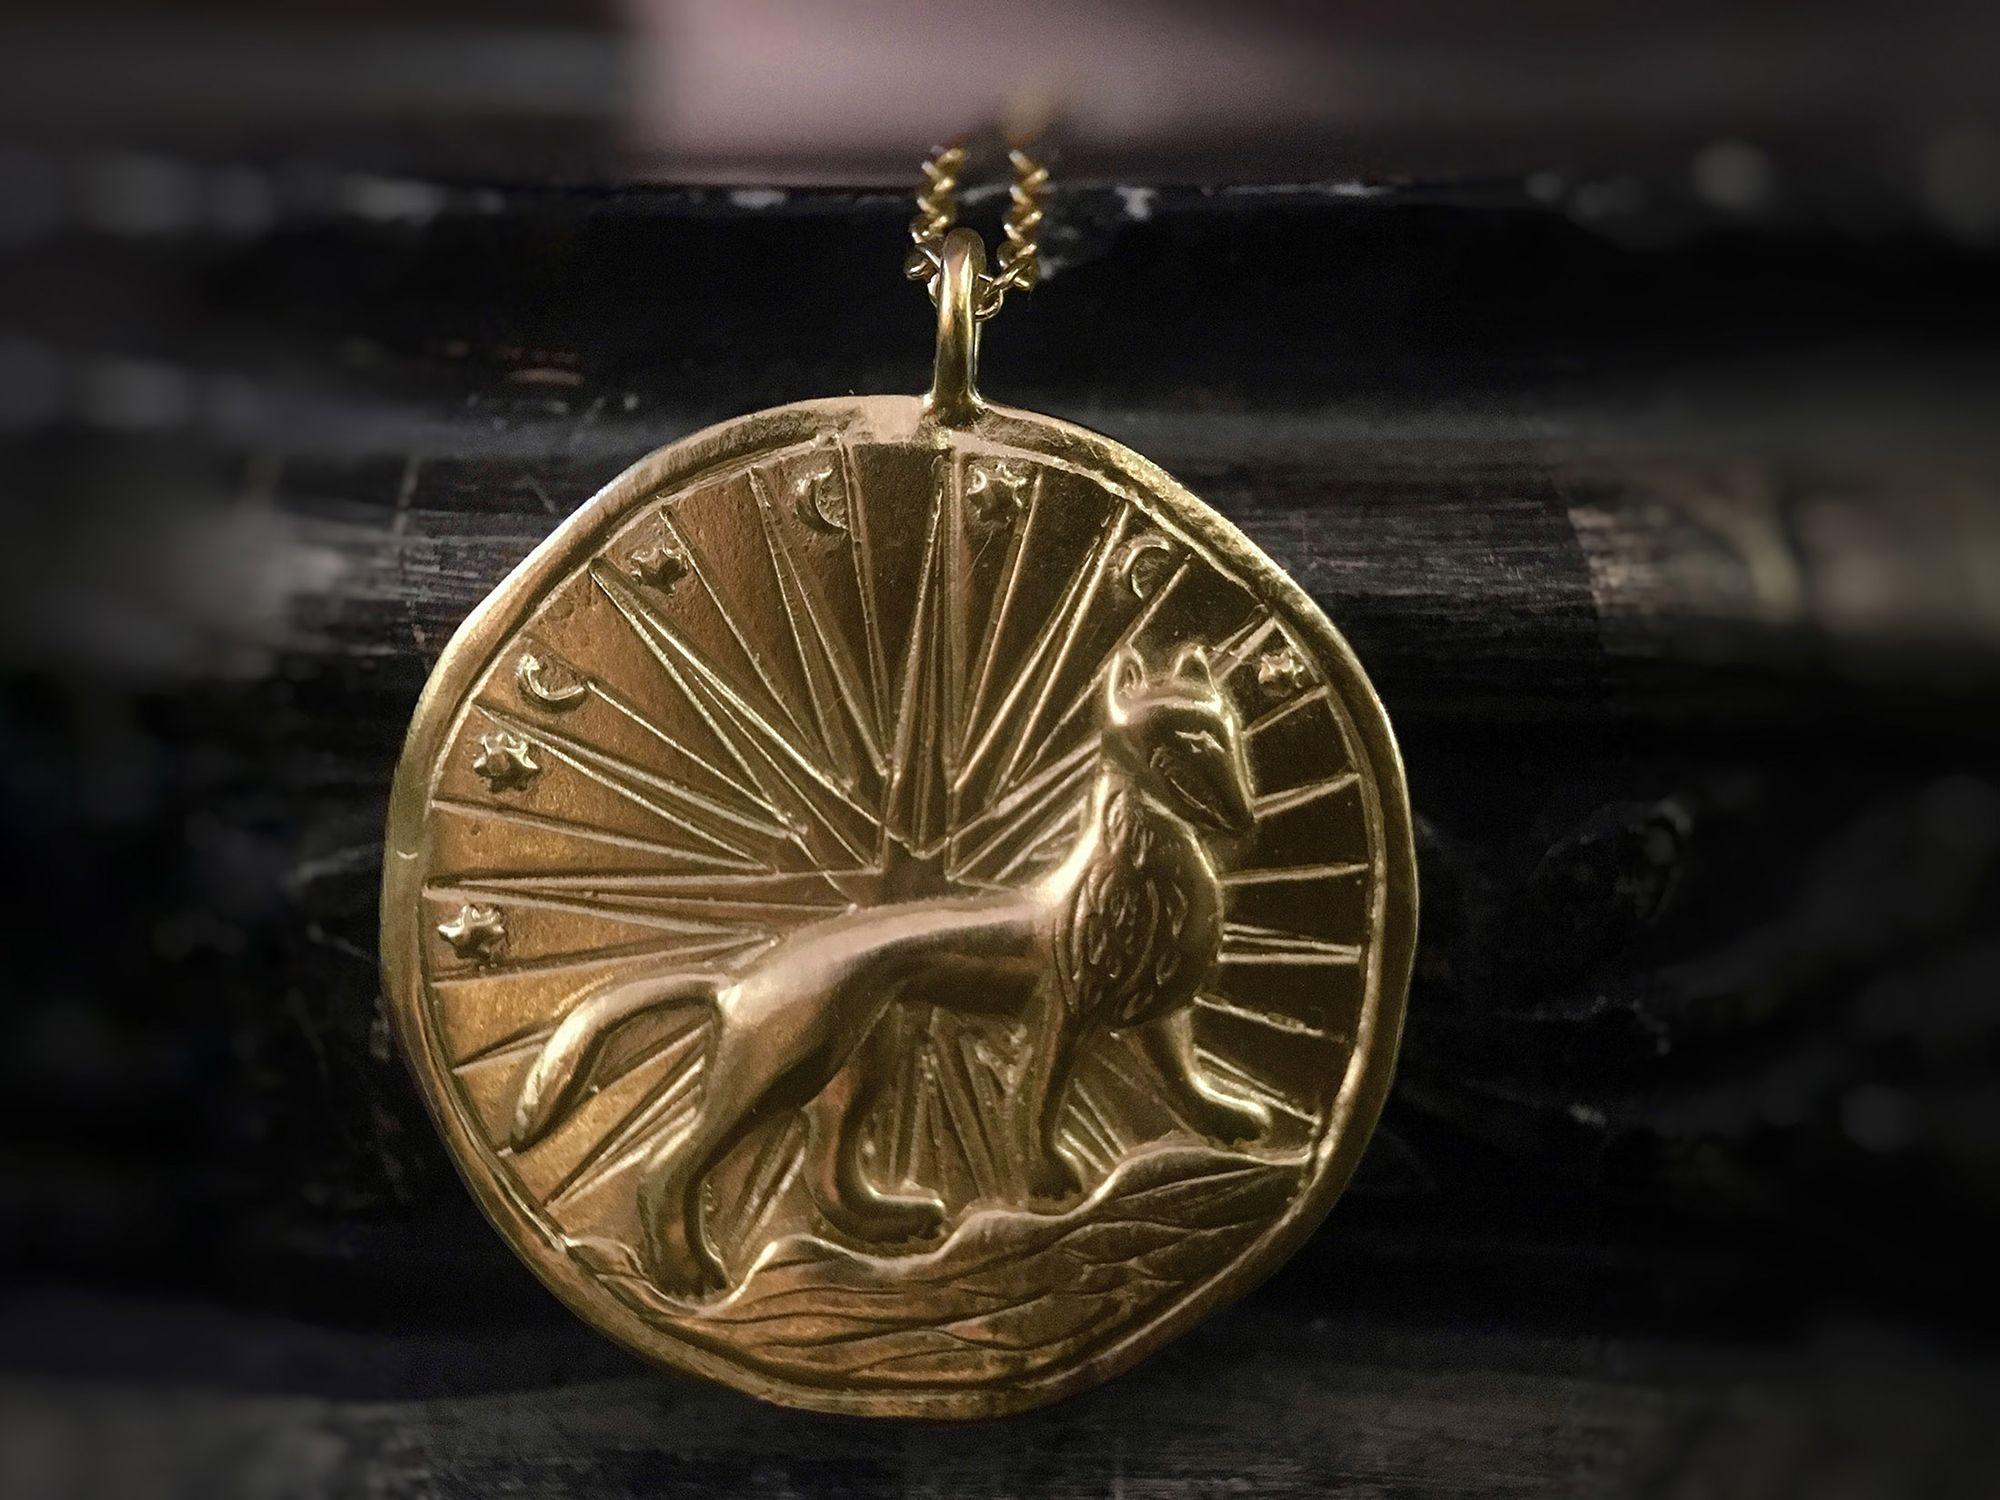 Hermione necklace by Emmanuelle Zysman